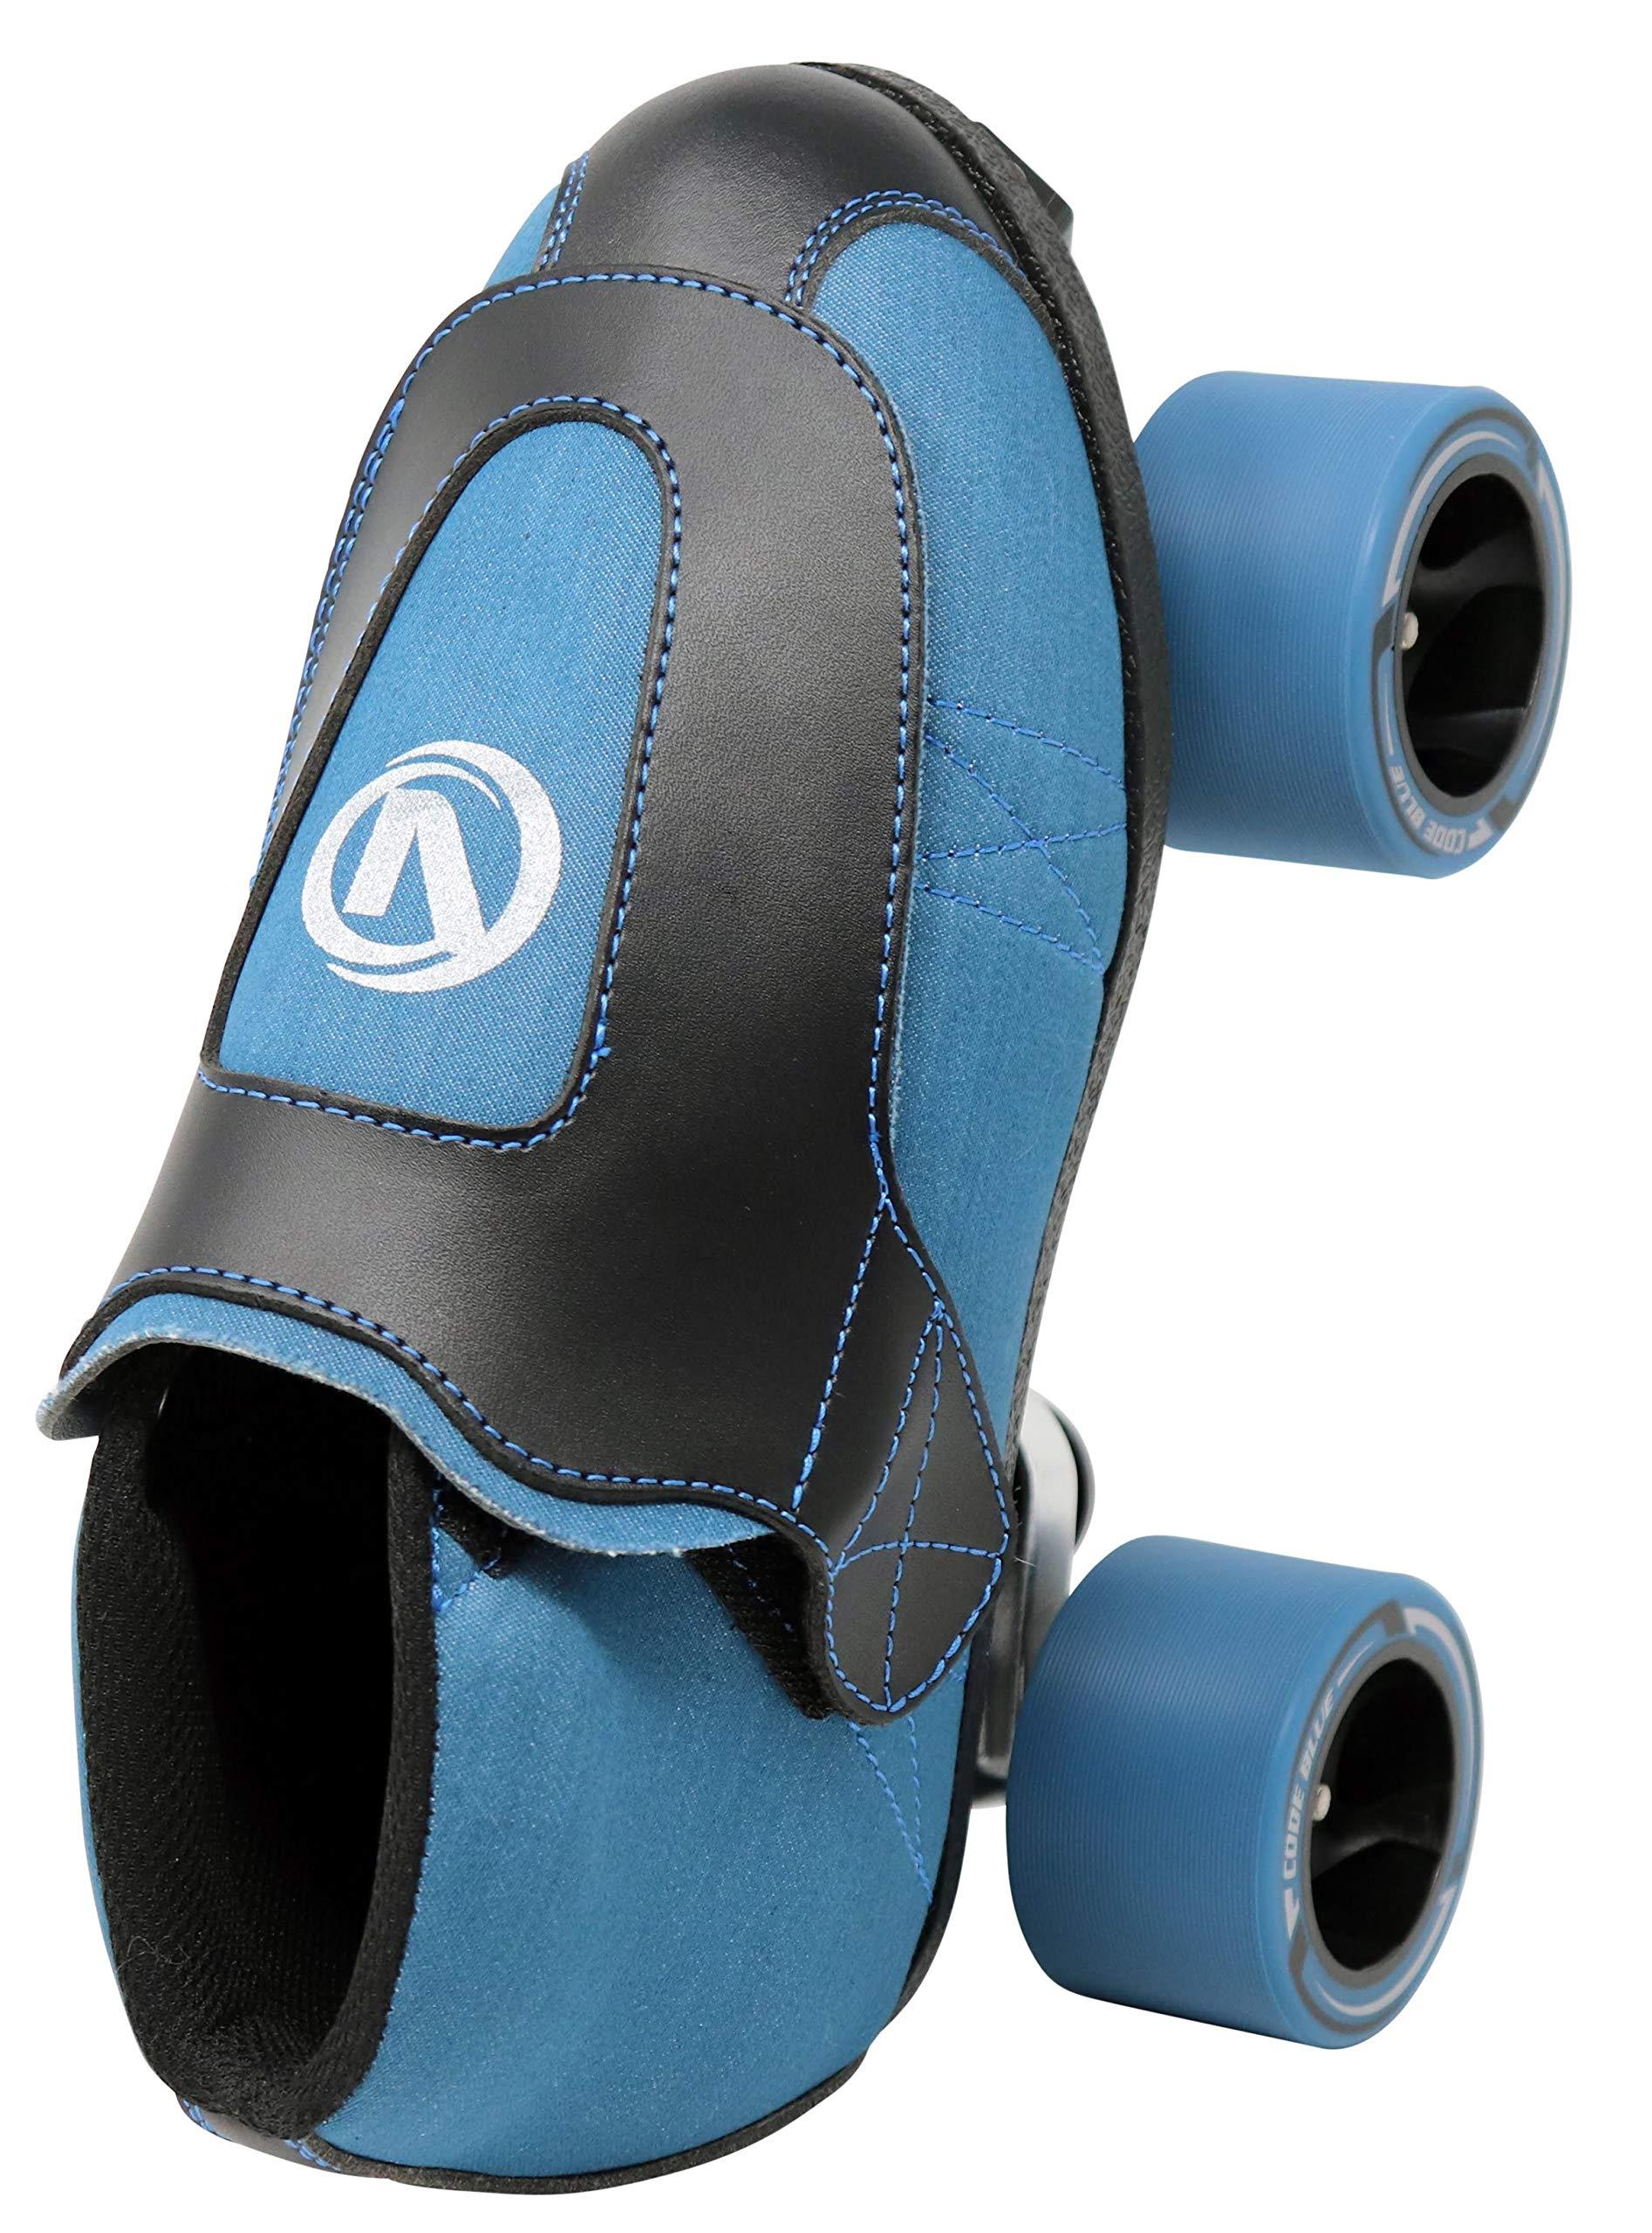 VNLA Code Blue Jam Skate - Mens & Womens Speed Skates - Quad Skates for Women & Men - Adjustable Roller Skate/Rollerskates - Outdoor & Indoor Adult Quad Skate - Kid/Kids Roller Skates (Size 9) by VNLA (Image #4)